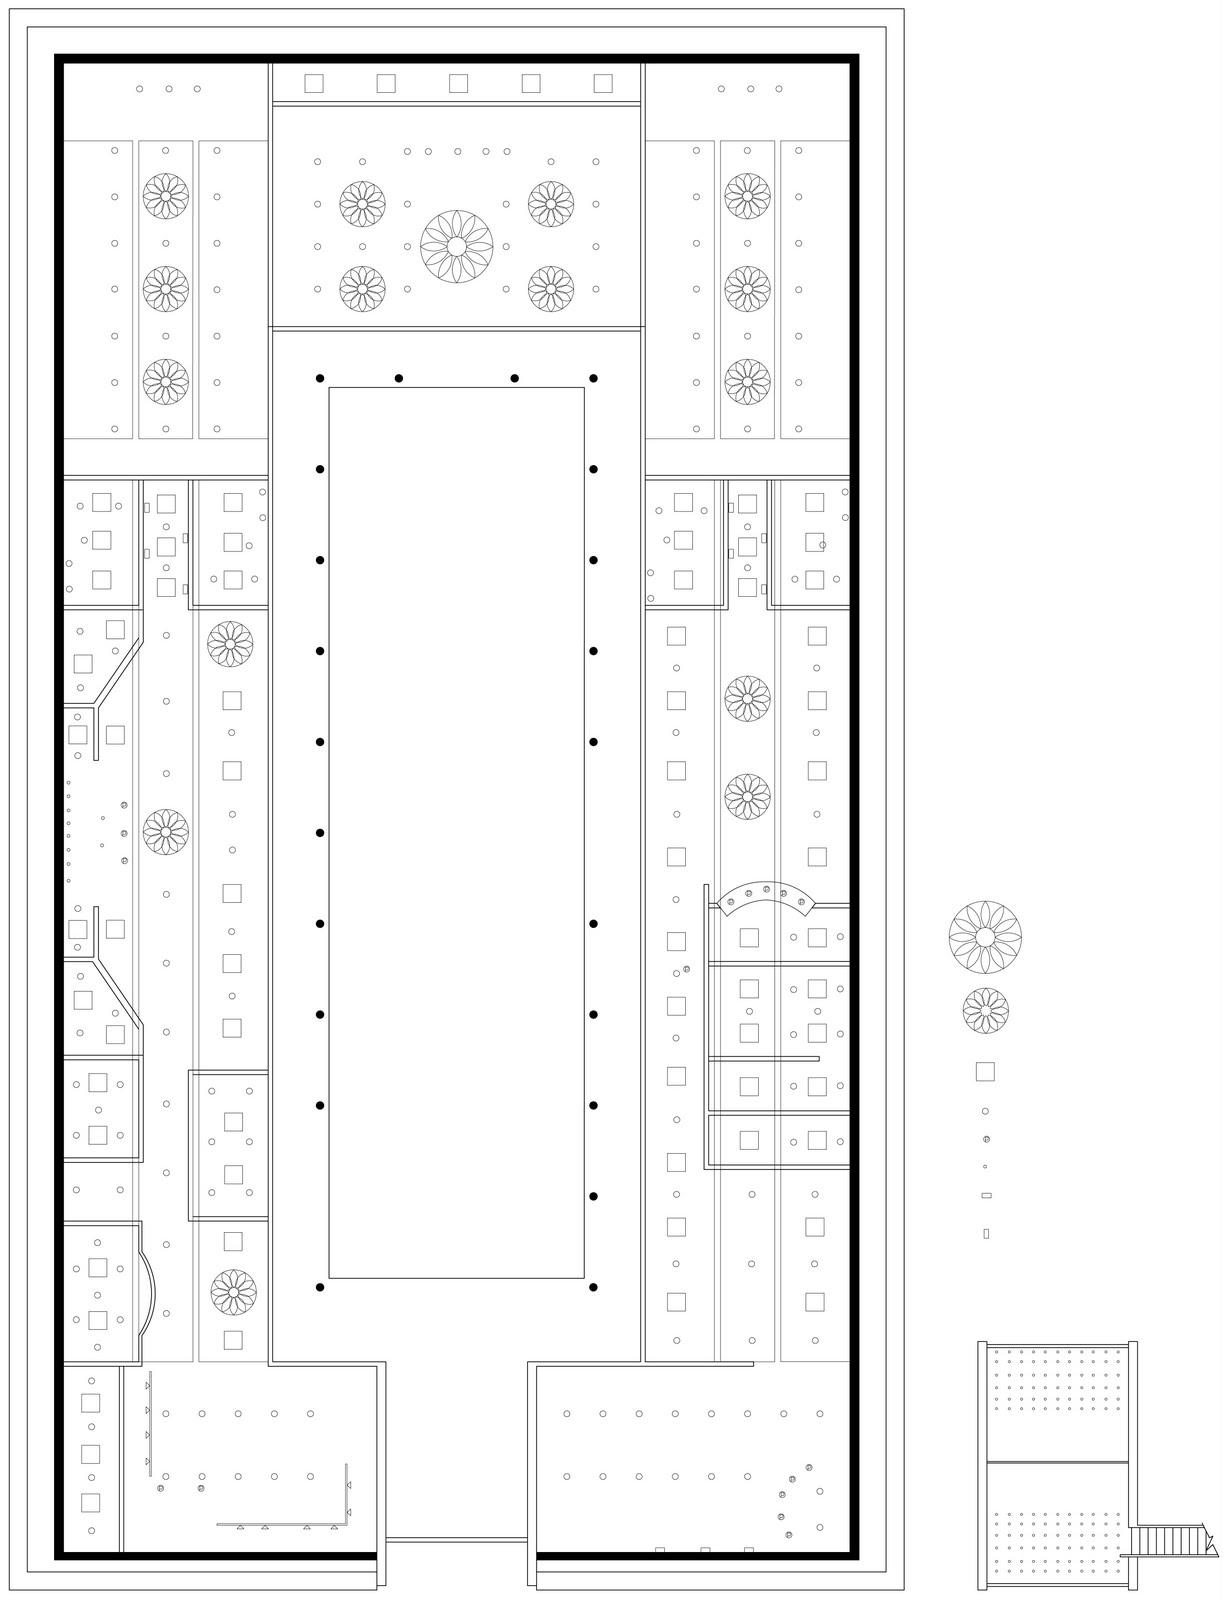 ID 3753 Britt Davies: Courtyard Style floor plan and reflected ...